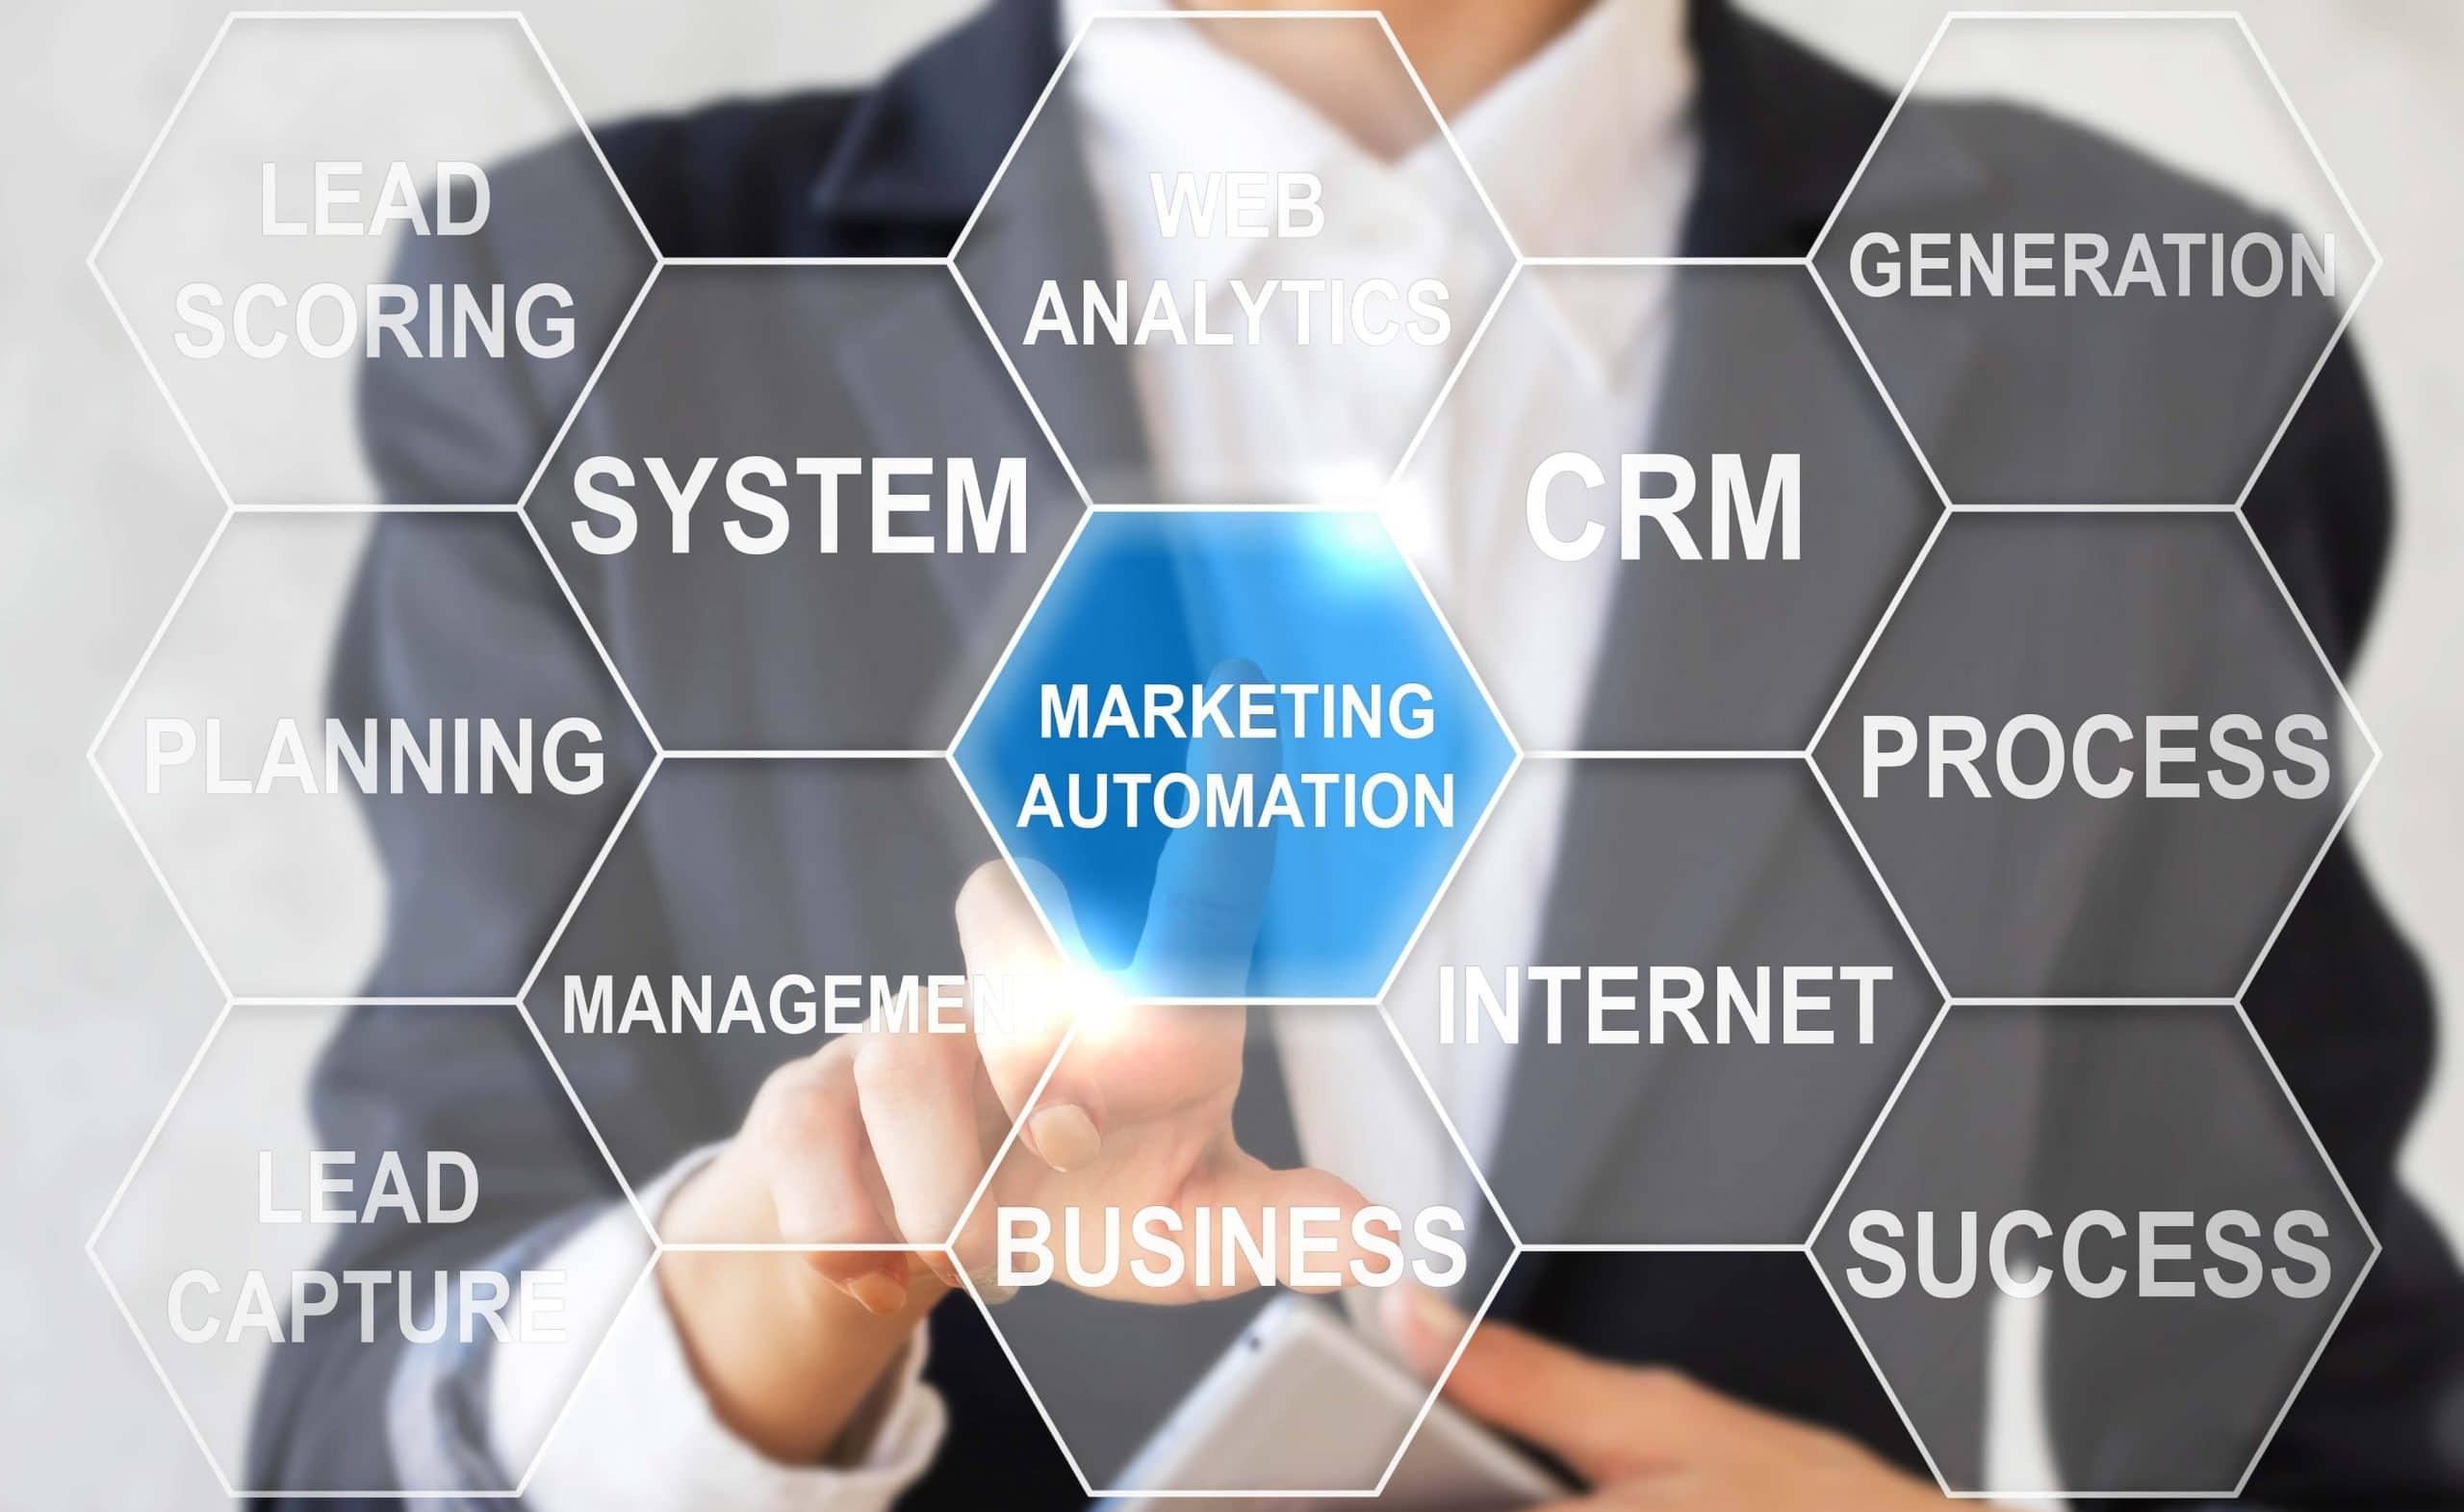 marketing automation i crm